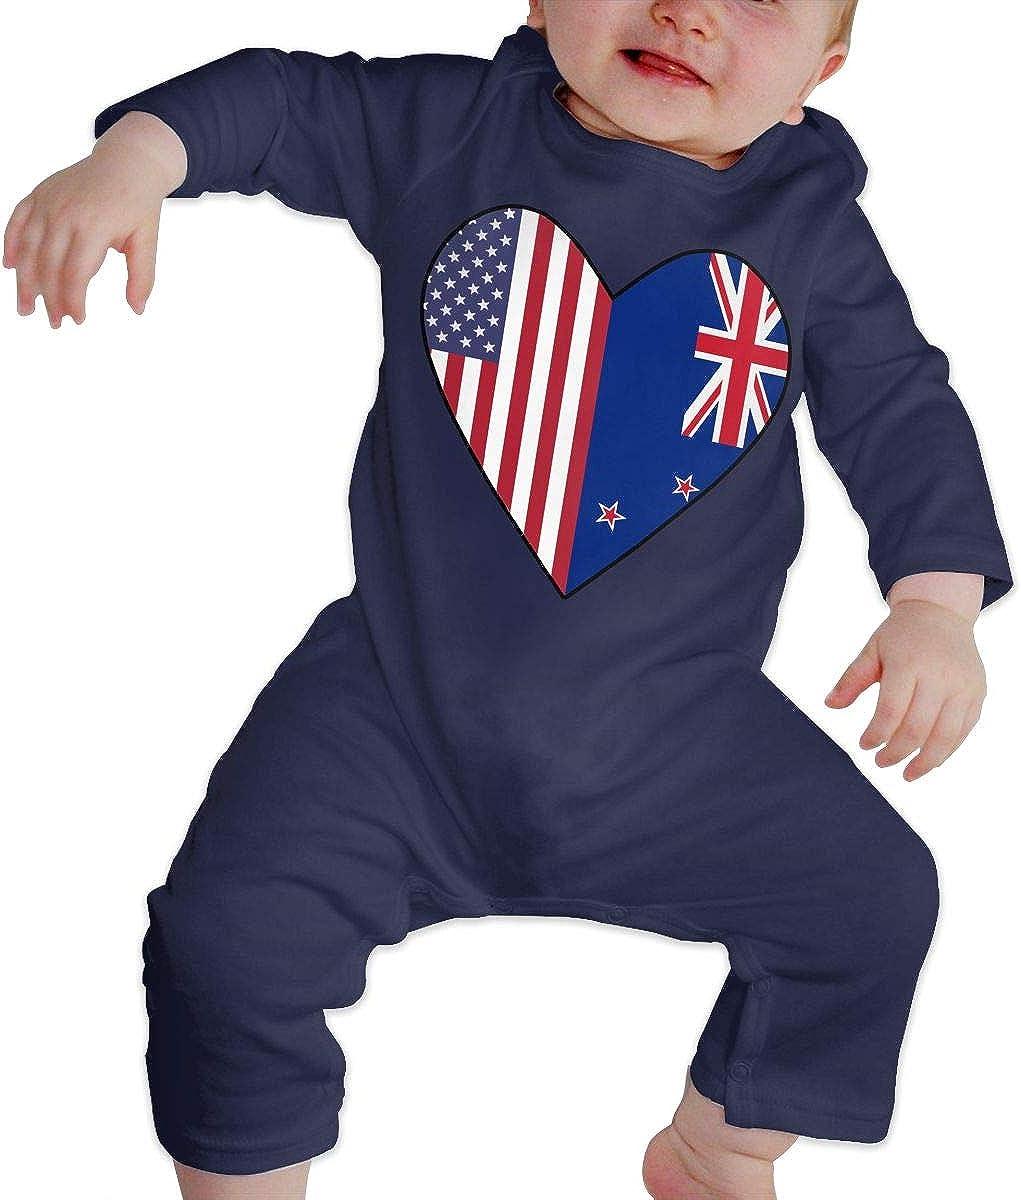 VANMASS Little Babys Life Behind Bars Short Sleeve Climbing Bodysuits Baby Playsuit